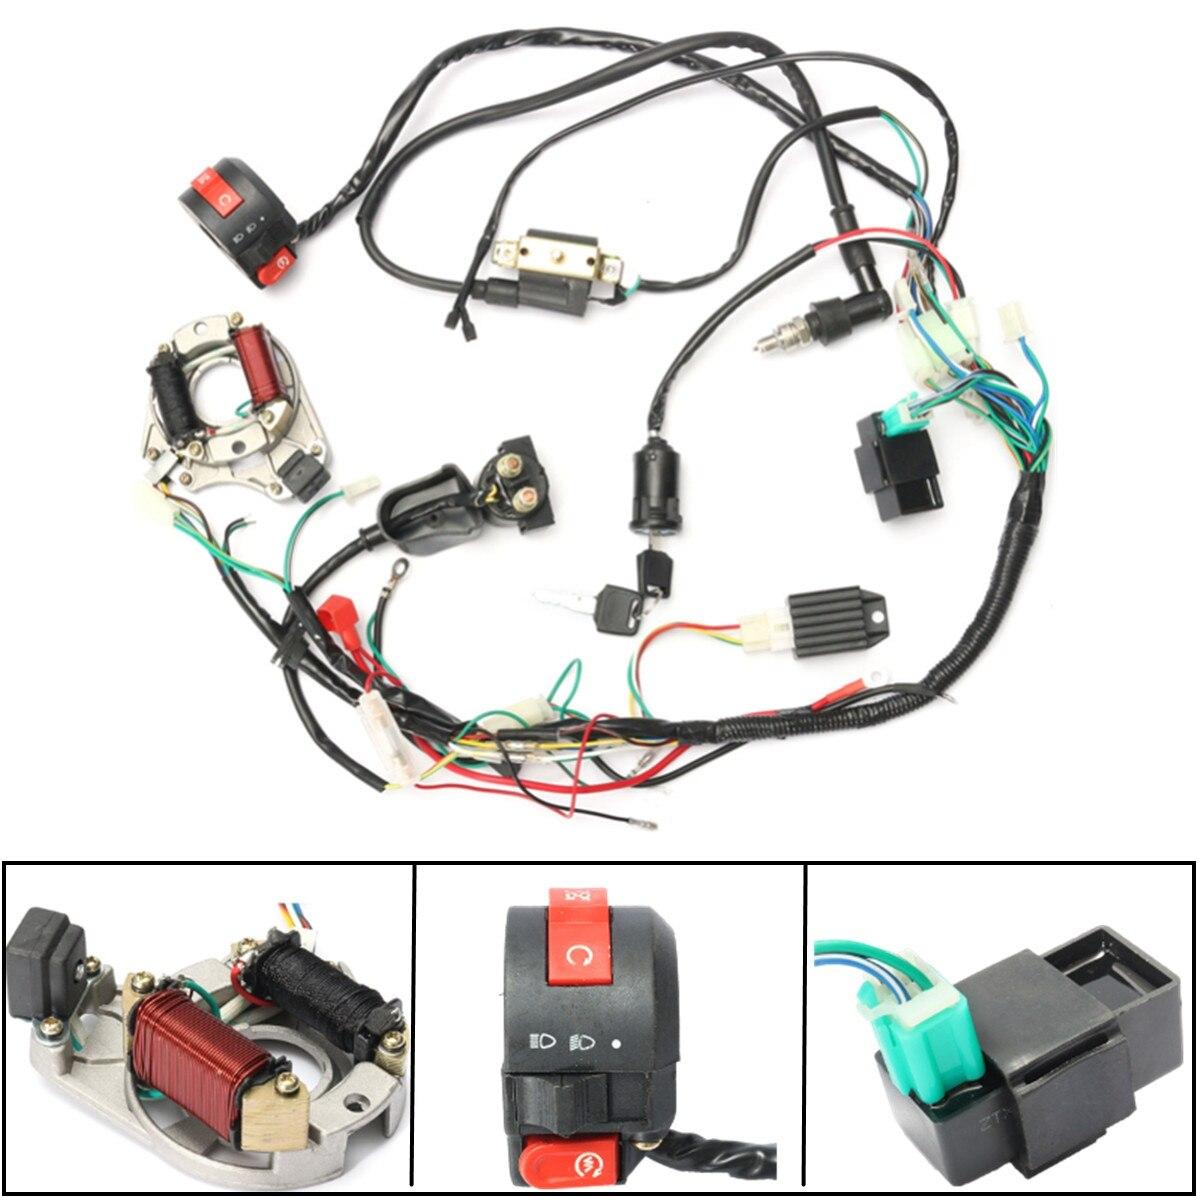 CDI Wire Harness Stator Assembly Wiring for ATV Electric Quad 50CC 70CC 90CC 110CC 125CC